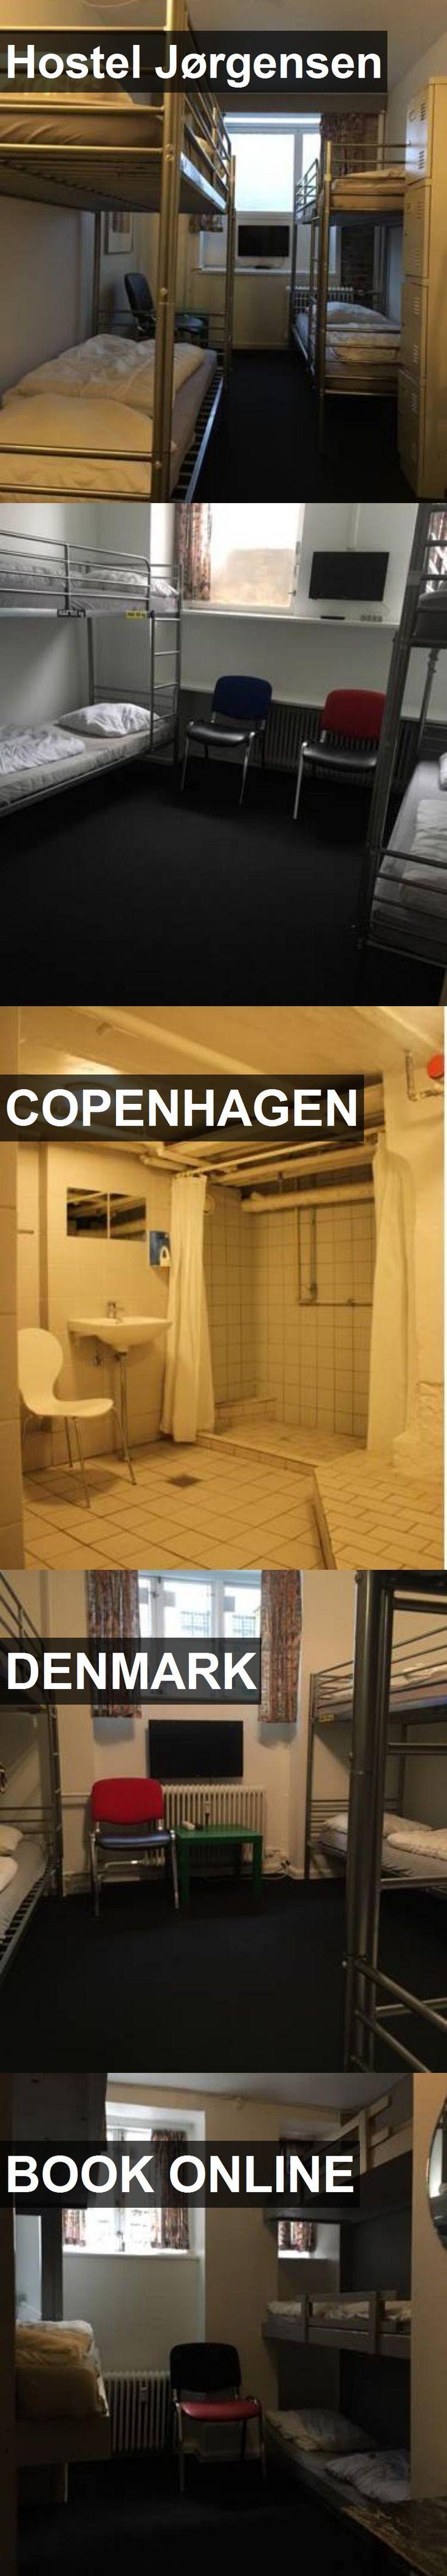 Hotel Hostel Jørgensen in Copenhagen, Denmark. For more information, photos, reviews and best prices please follow the link. #Denmark #Copenhagen #hotel #travel #vacation